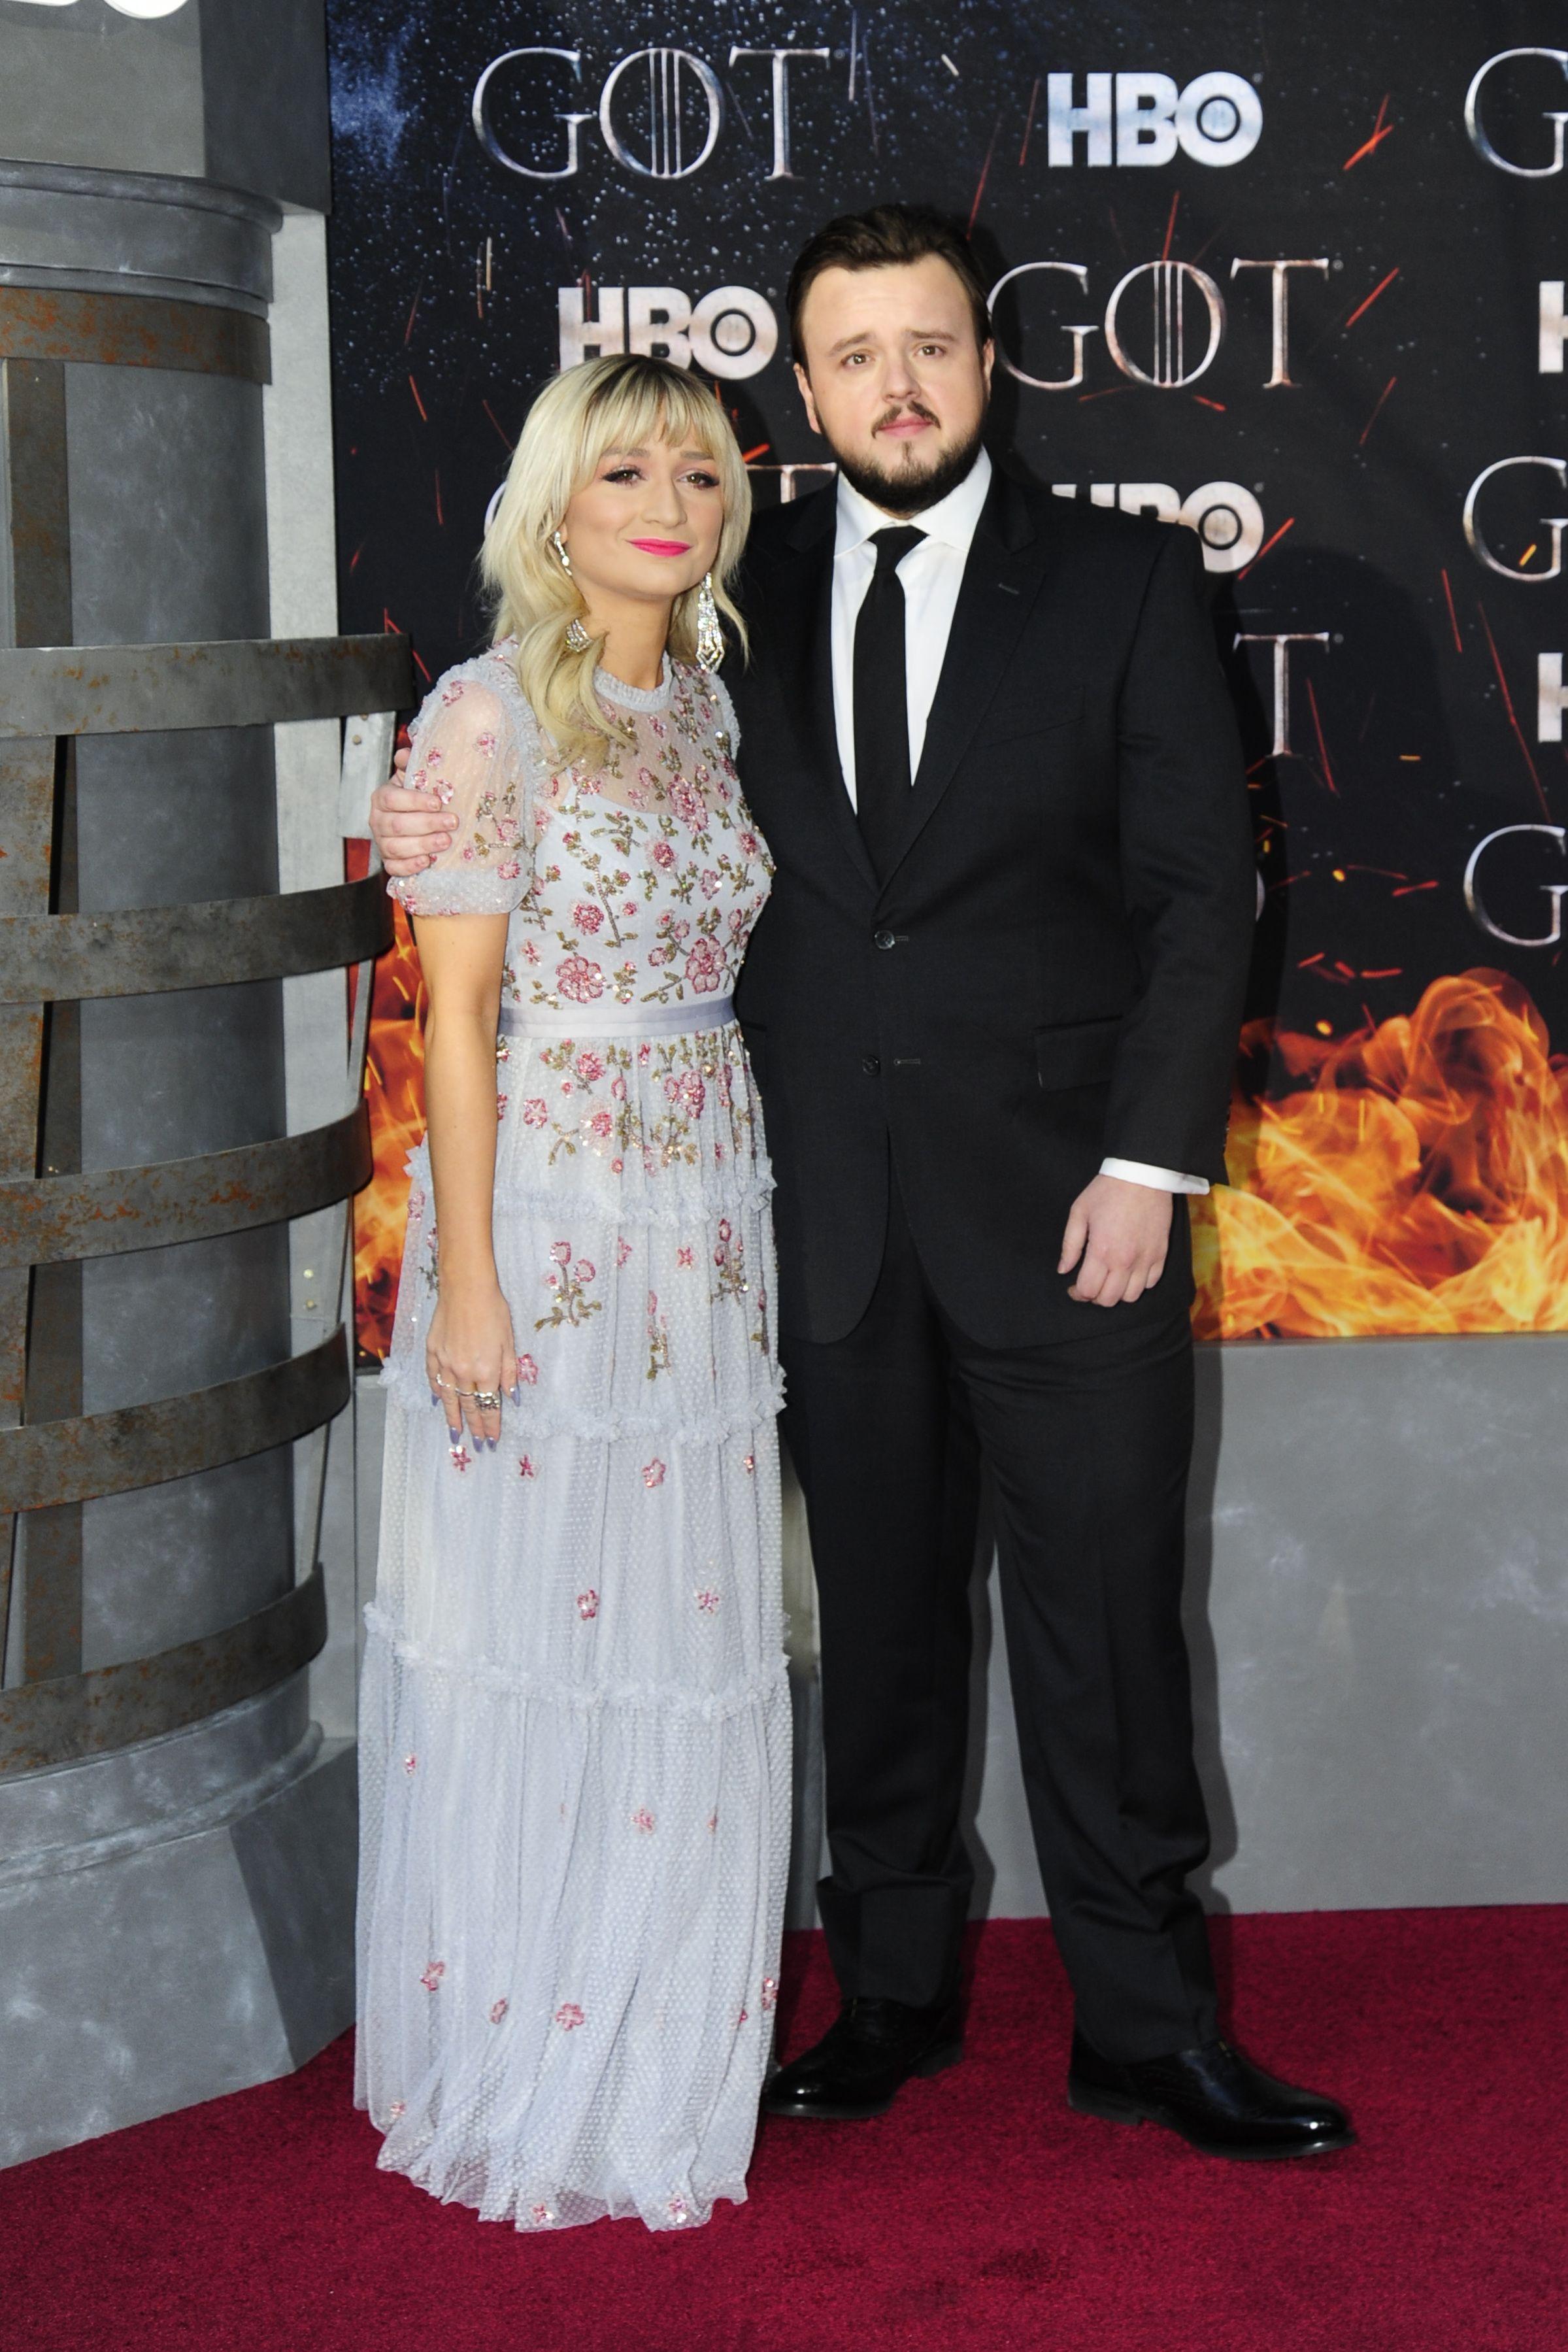 John Bradley (Samwell Tarly) and Rebecca April